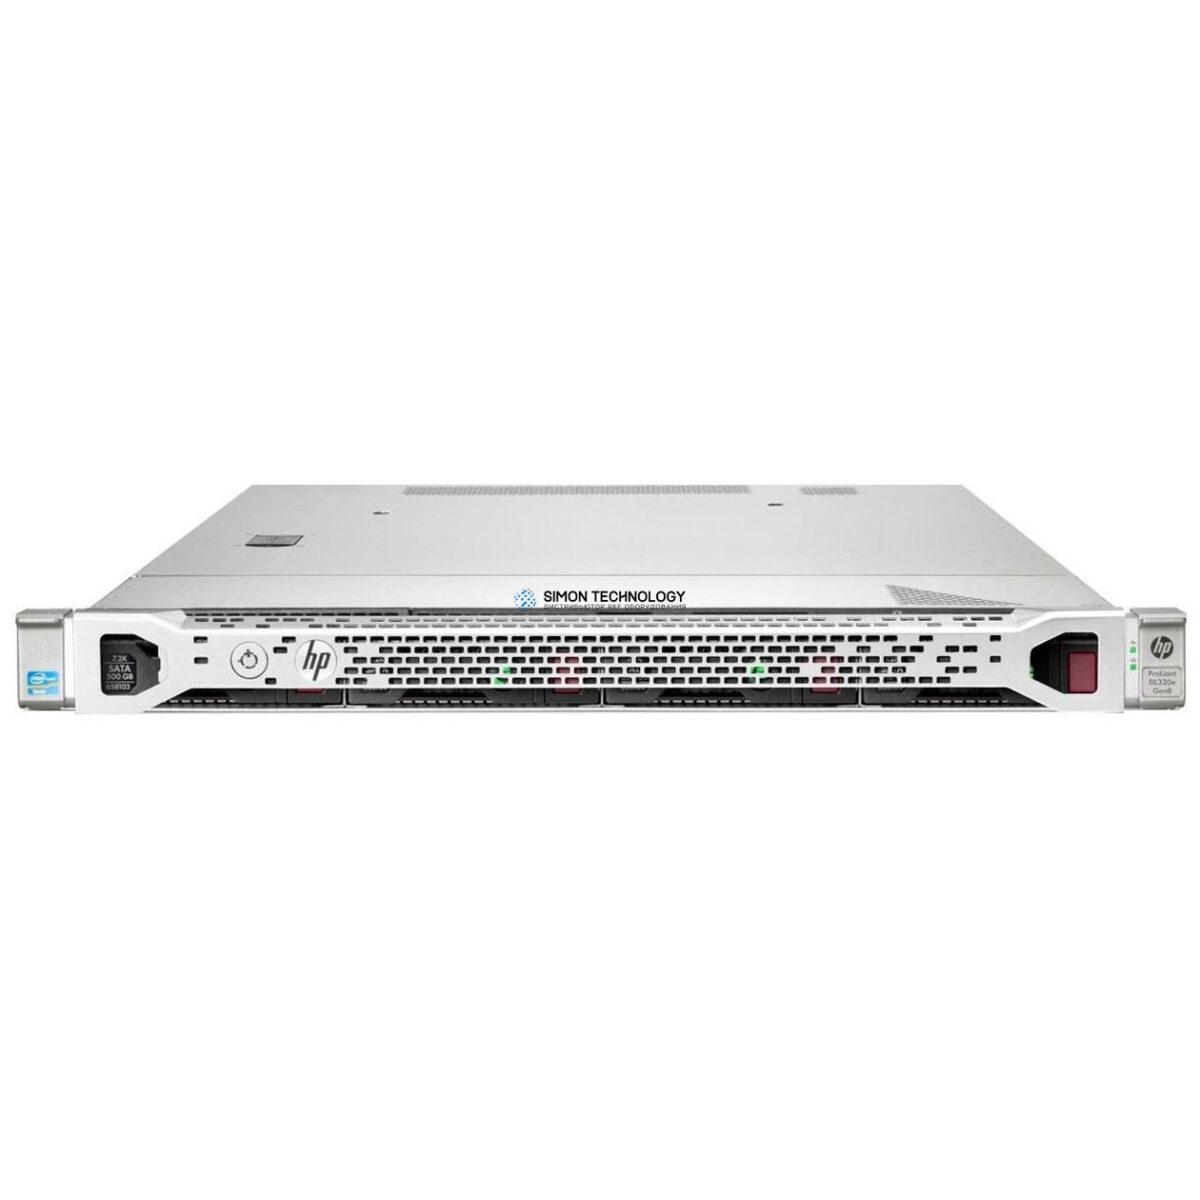 Сервер HP DL320 Gen 8 Configure To Order Server (722547-421)